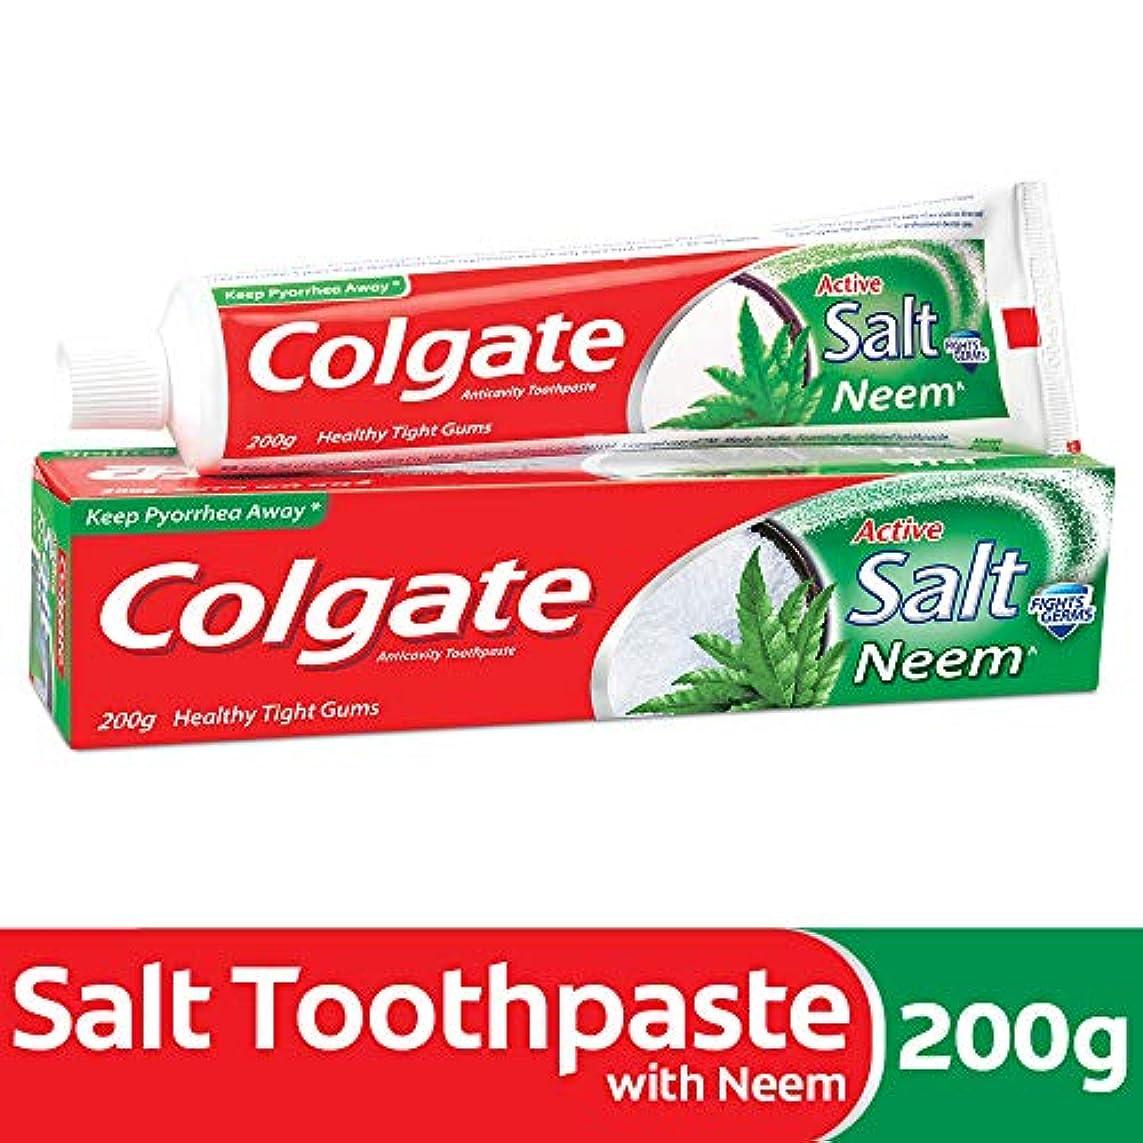 通訳強打最終Colgate Active Salt Neem Anticavity Toothpaste - 200g